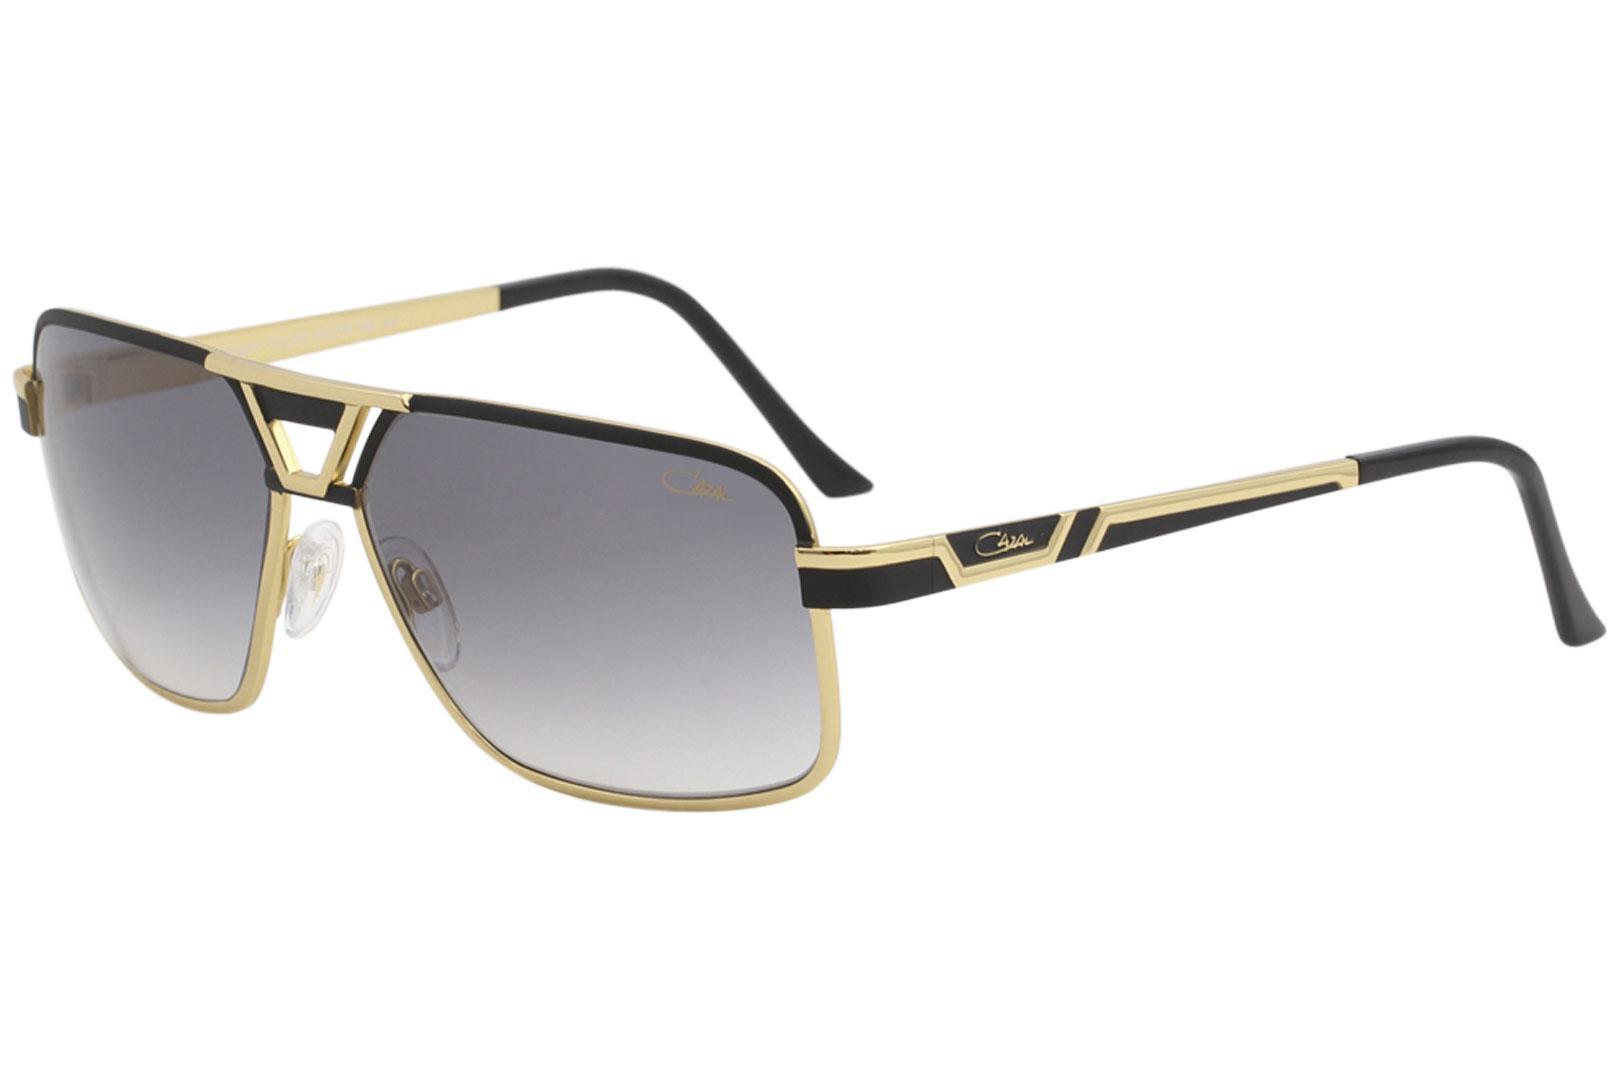 d27ce6282c Cazal Men s 9071 Retro Pilot Sunglasses by Cazal